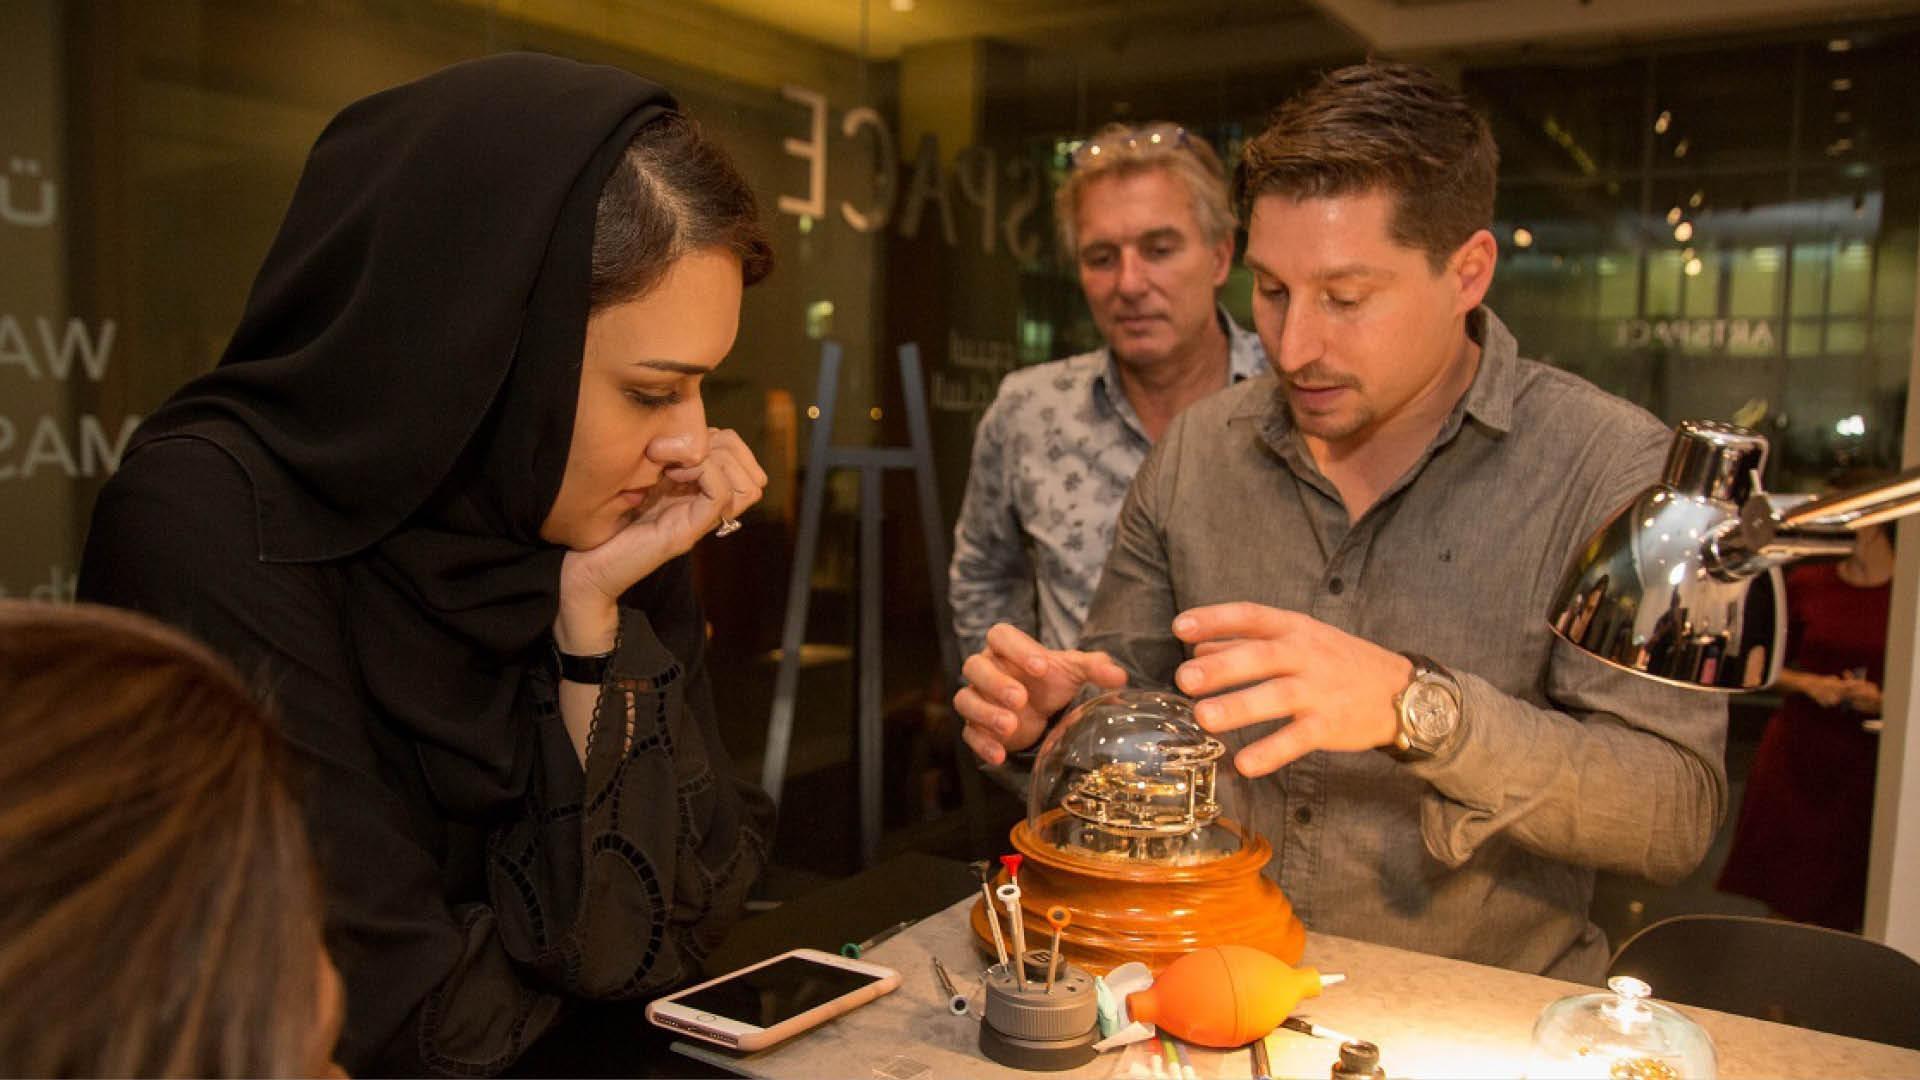 Dubai Watch Week 2017: Interview With Director Melika Yazdjerdi